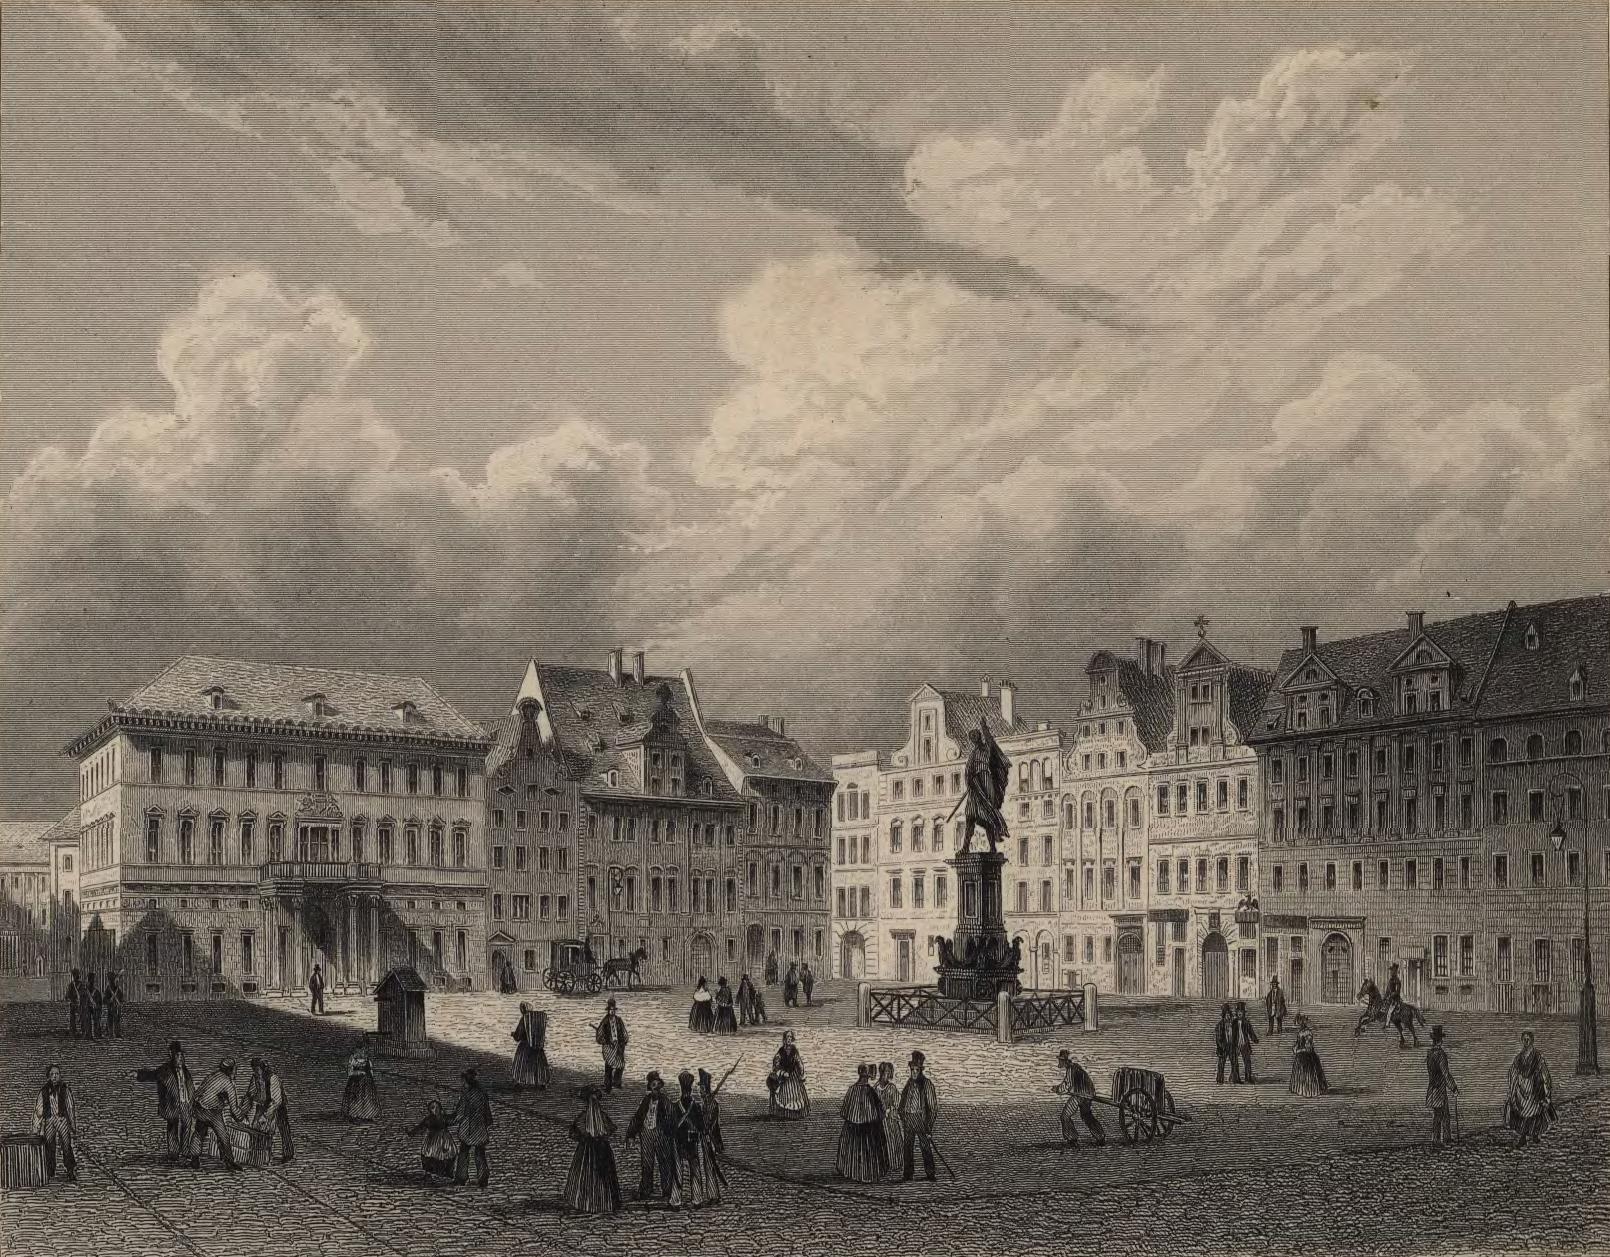 https://upload.wikimedia.org/wikipedia/commons/f/fd/Bl%C3%BCcherplatz_in_Breslau.jpg